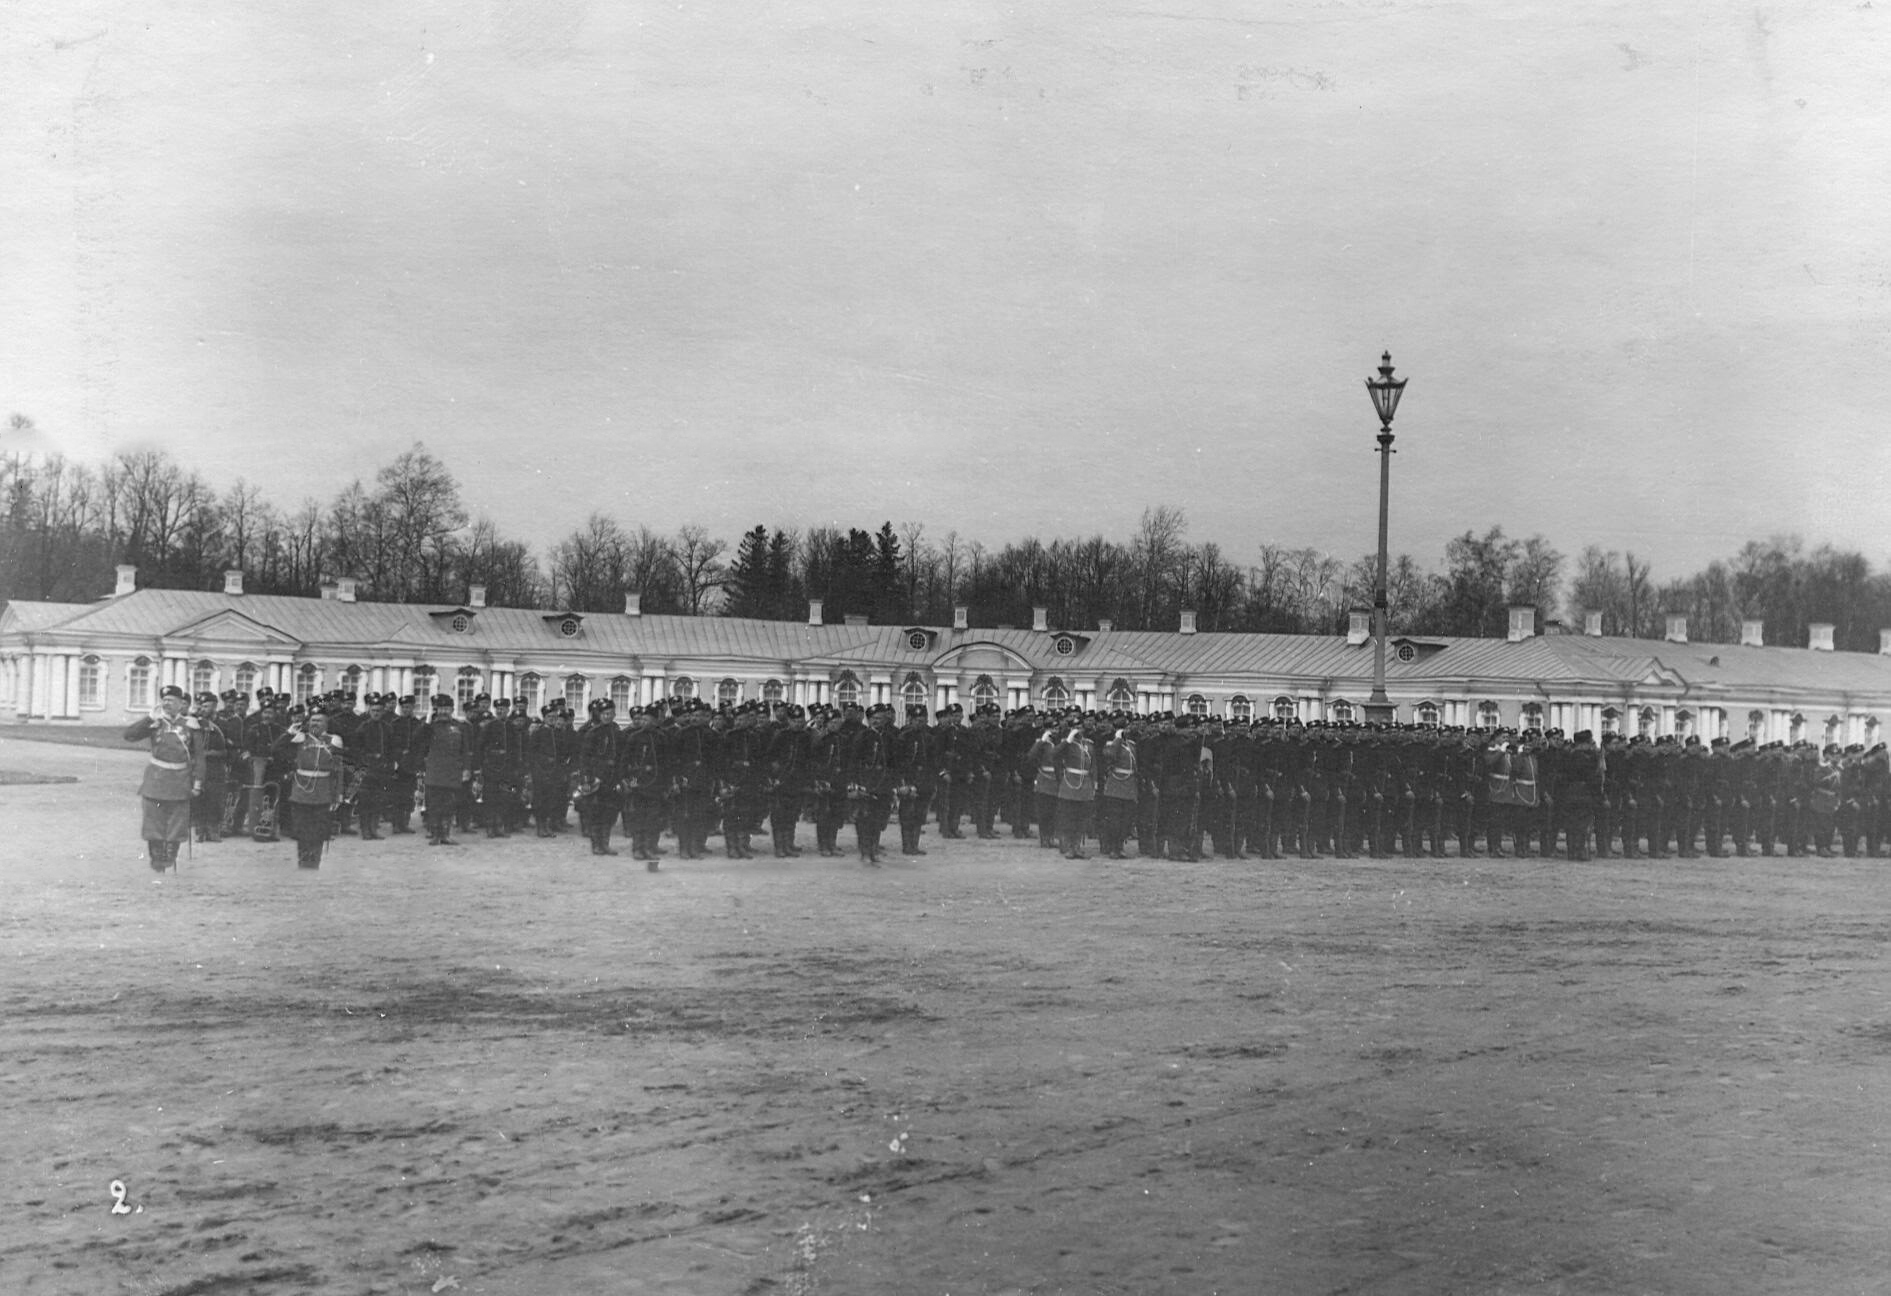 Парад 2-го стрелкового Царскосельского батальона. 7 апреля 1903